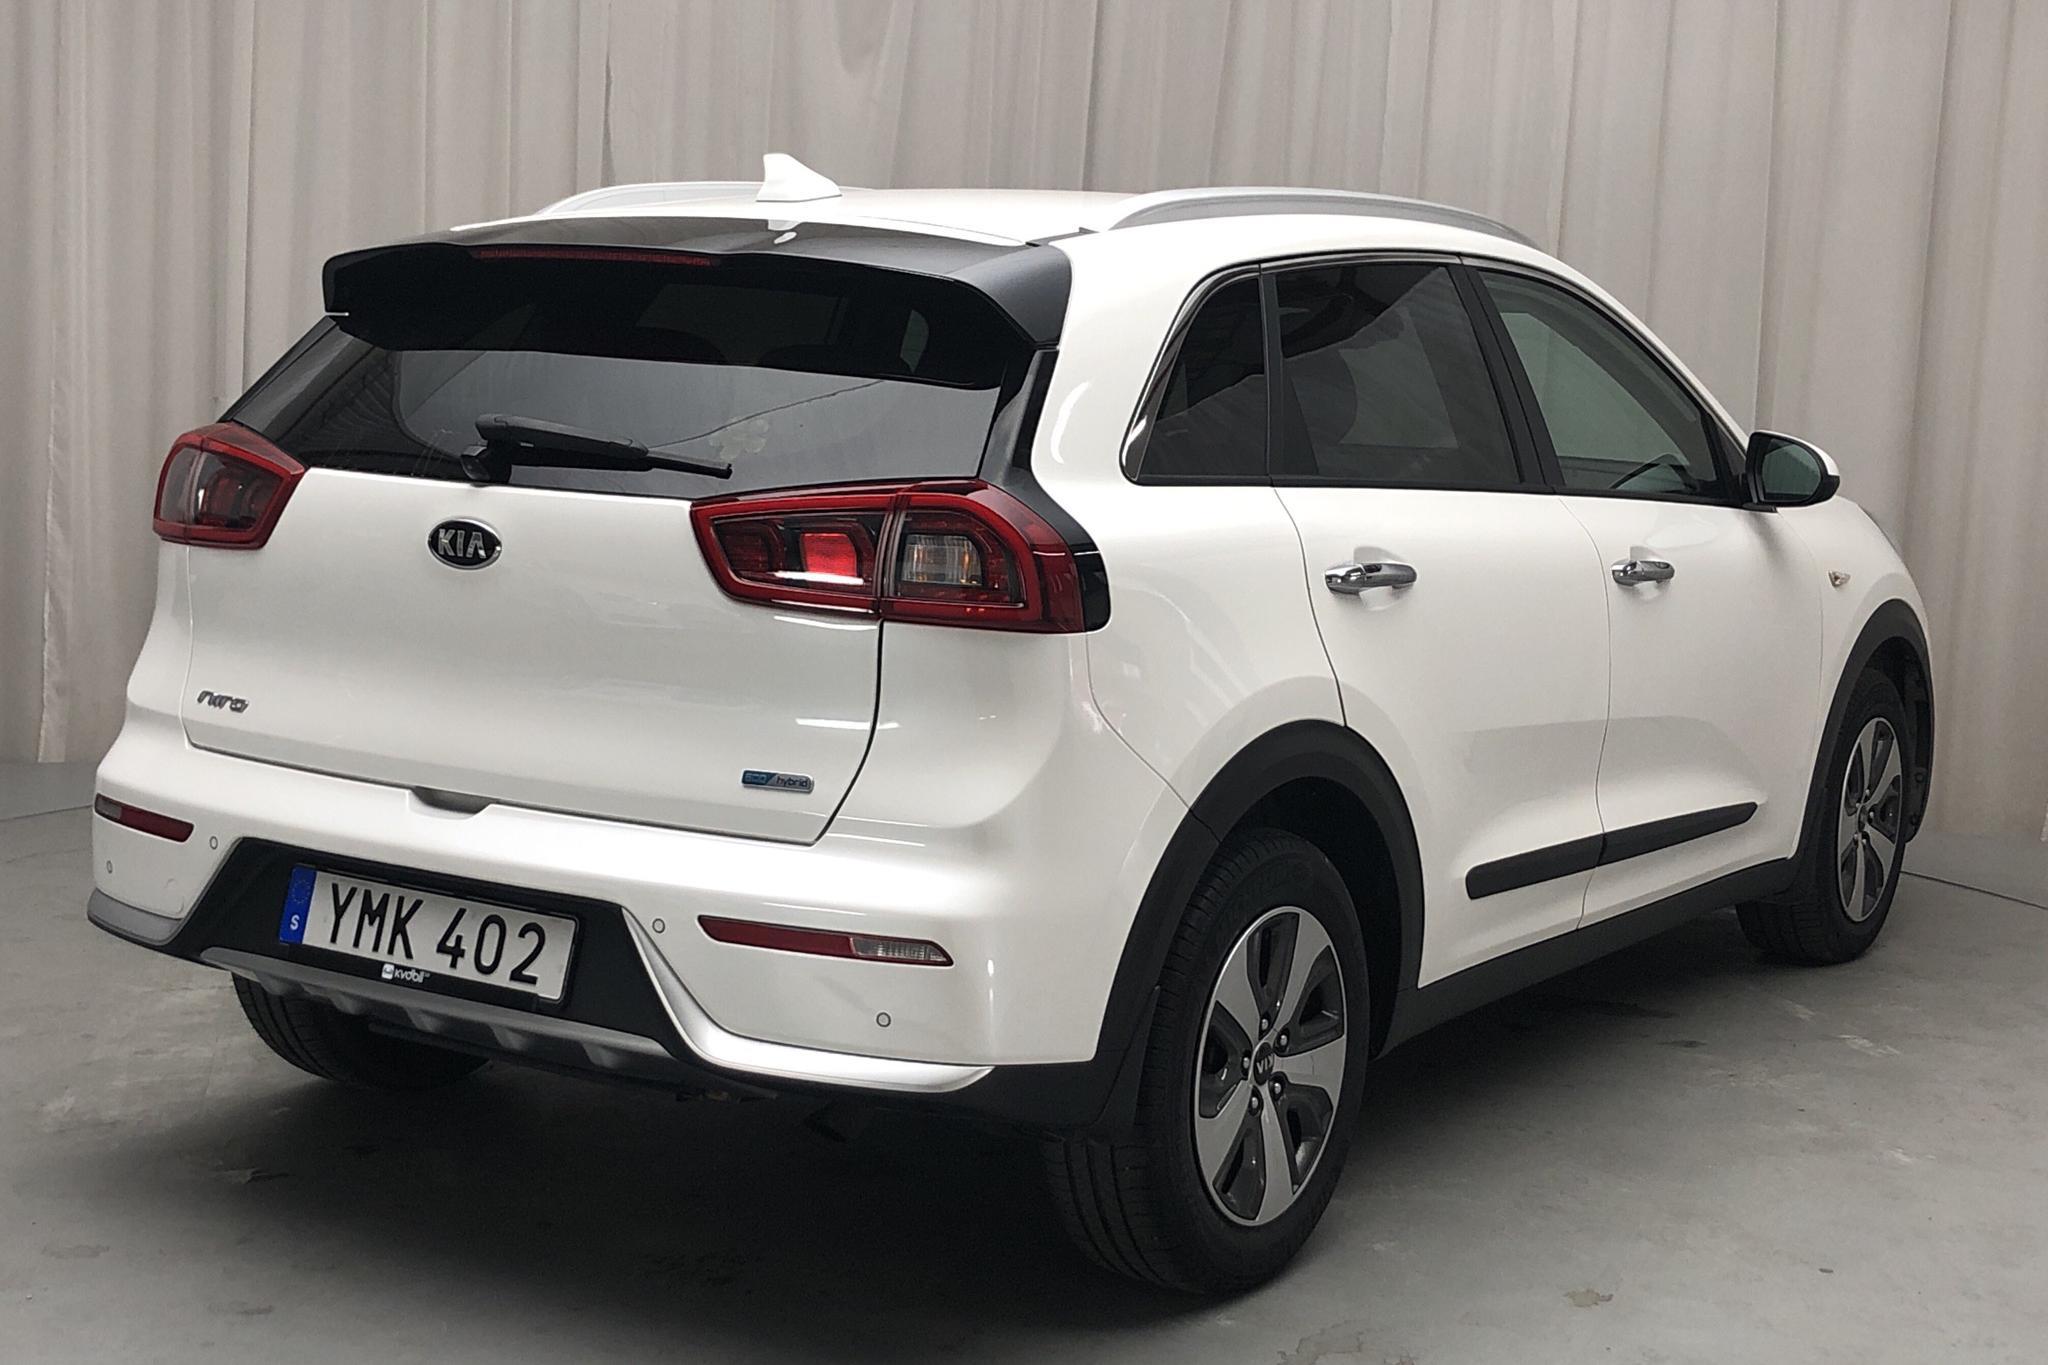 KIA Niro Hybrid 1.6 (141hk) - 64 070 km - Automatic - white - 2017